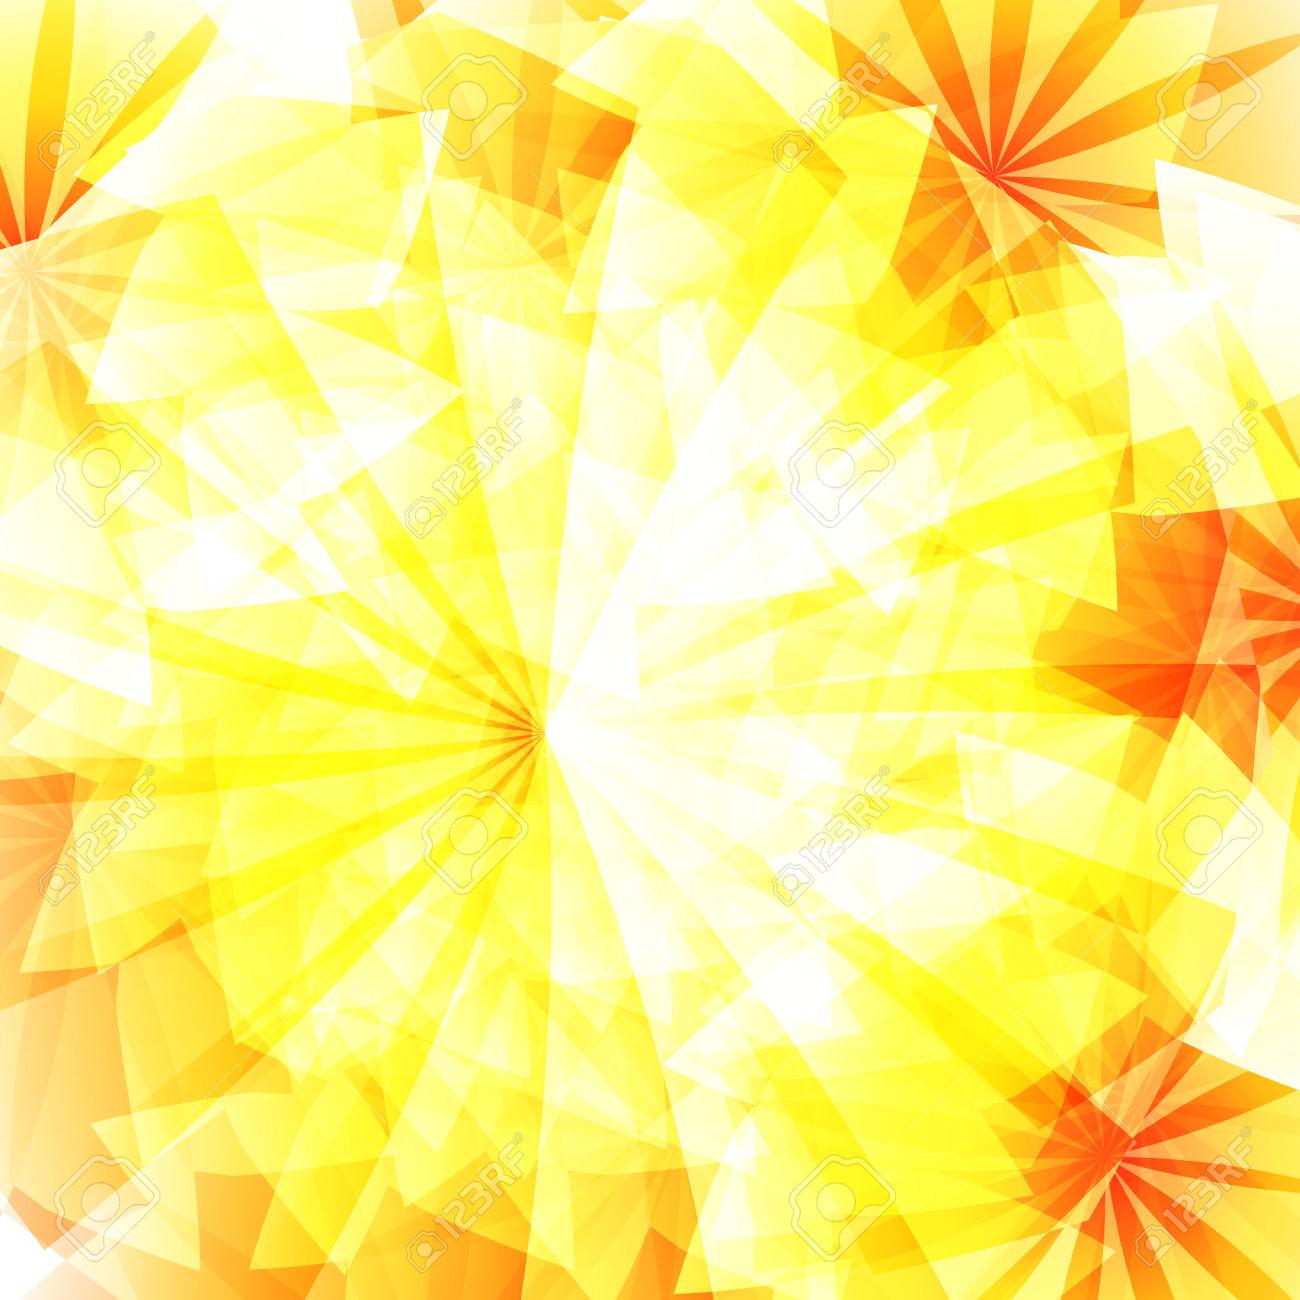 Autumn Holiday Background With Yellow Ray Orange Glow Sun Light.